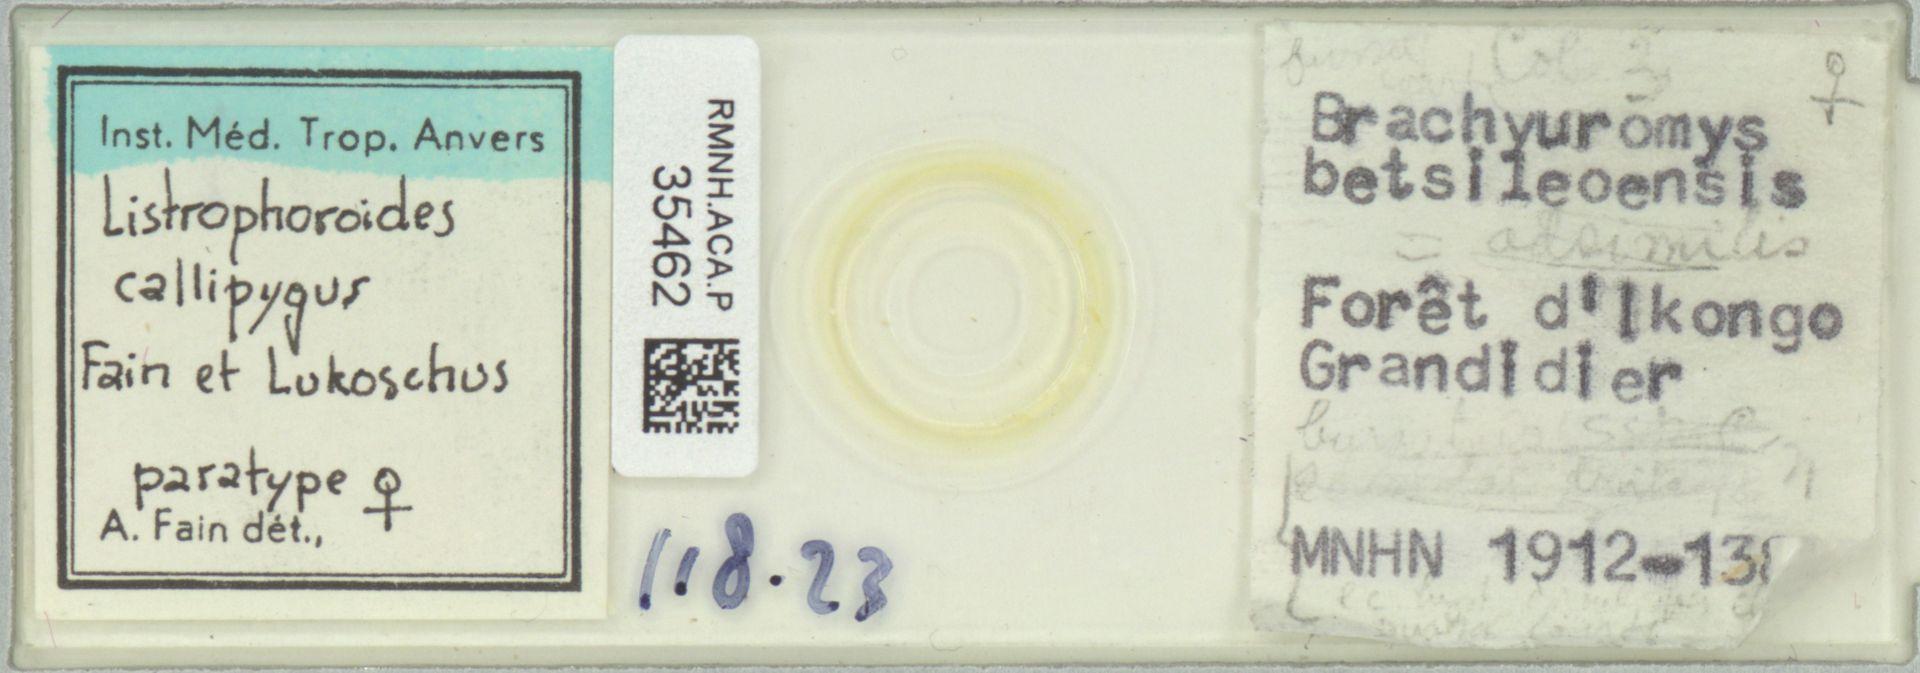 RMNH.ACA.P.35462 | Listrophoroides callipygus Fain et Lukoschus